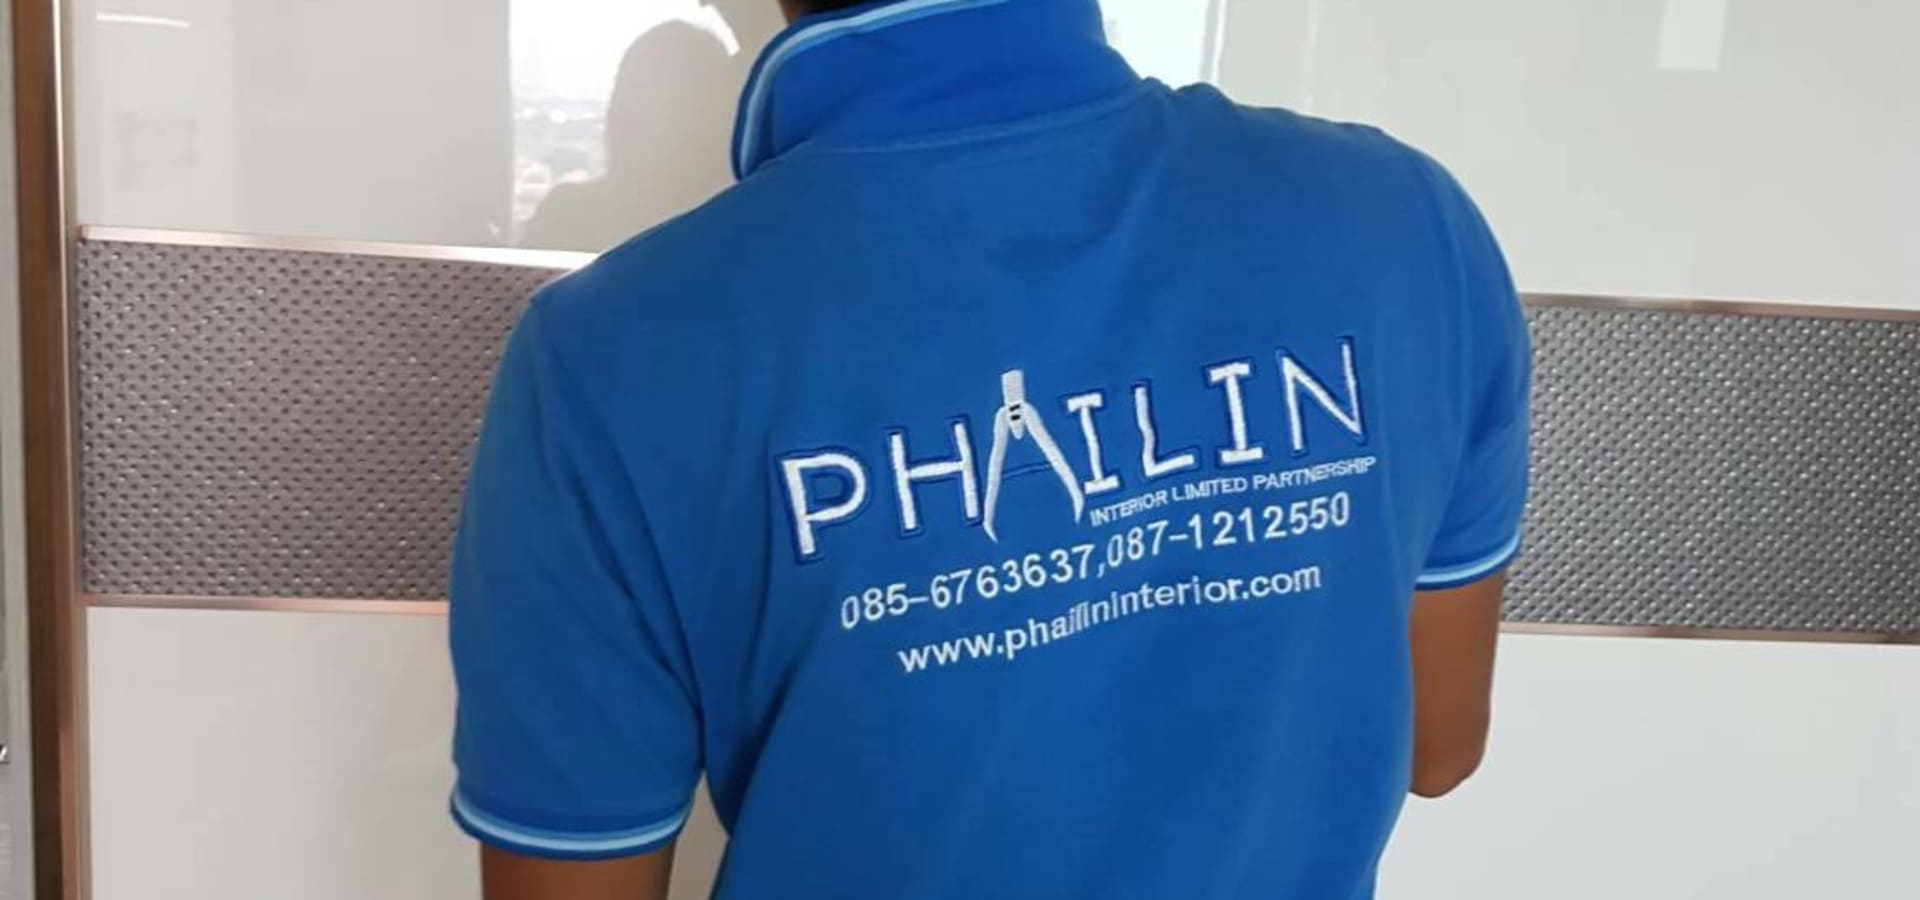 phailin